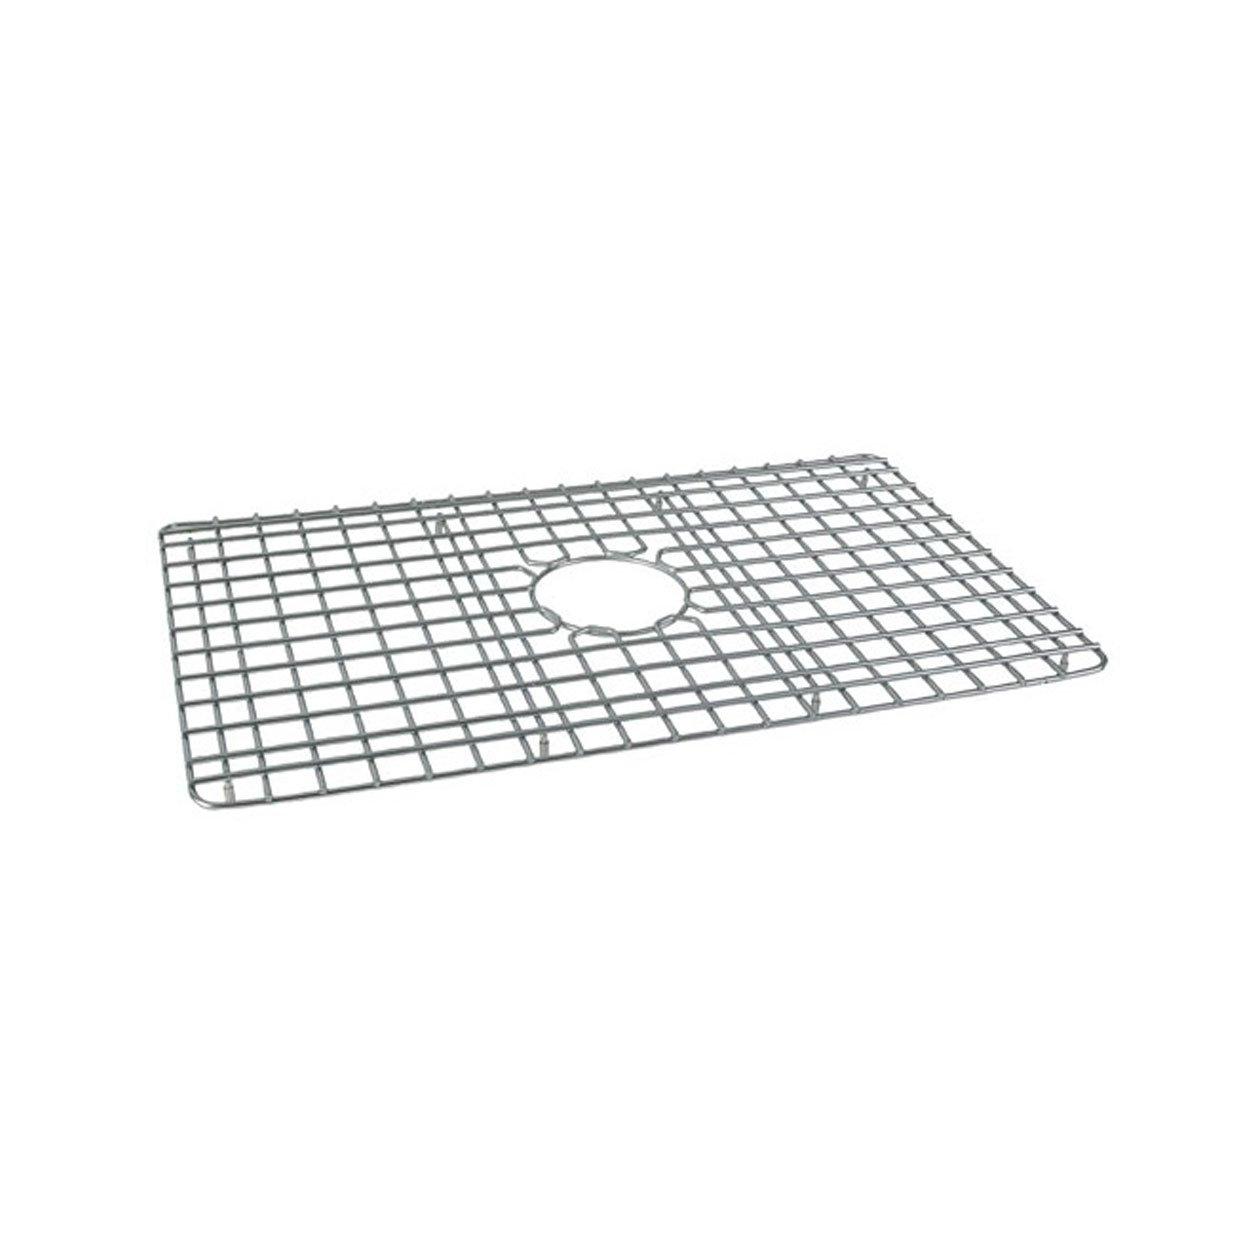 Franke PS12-36C Professional Series Bottom Sink Grid for PSX110138